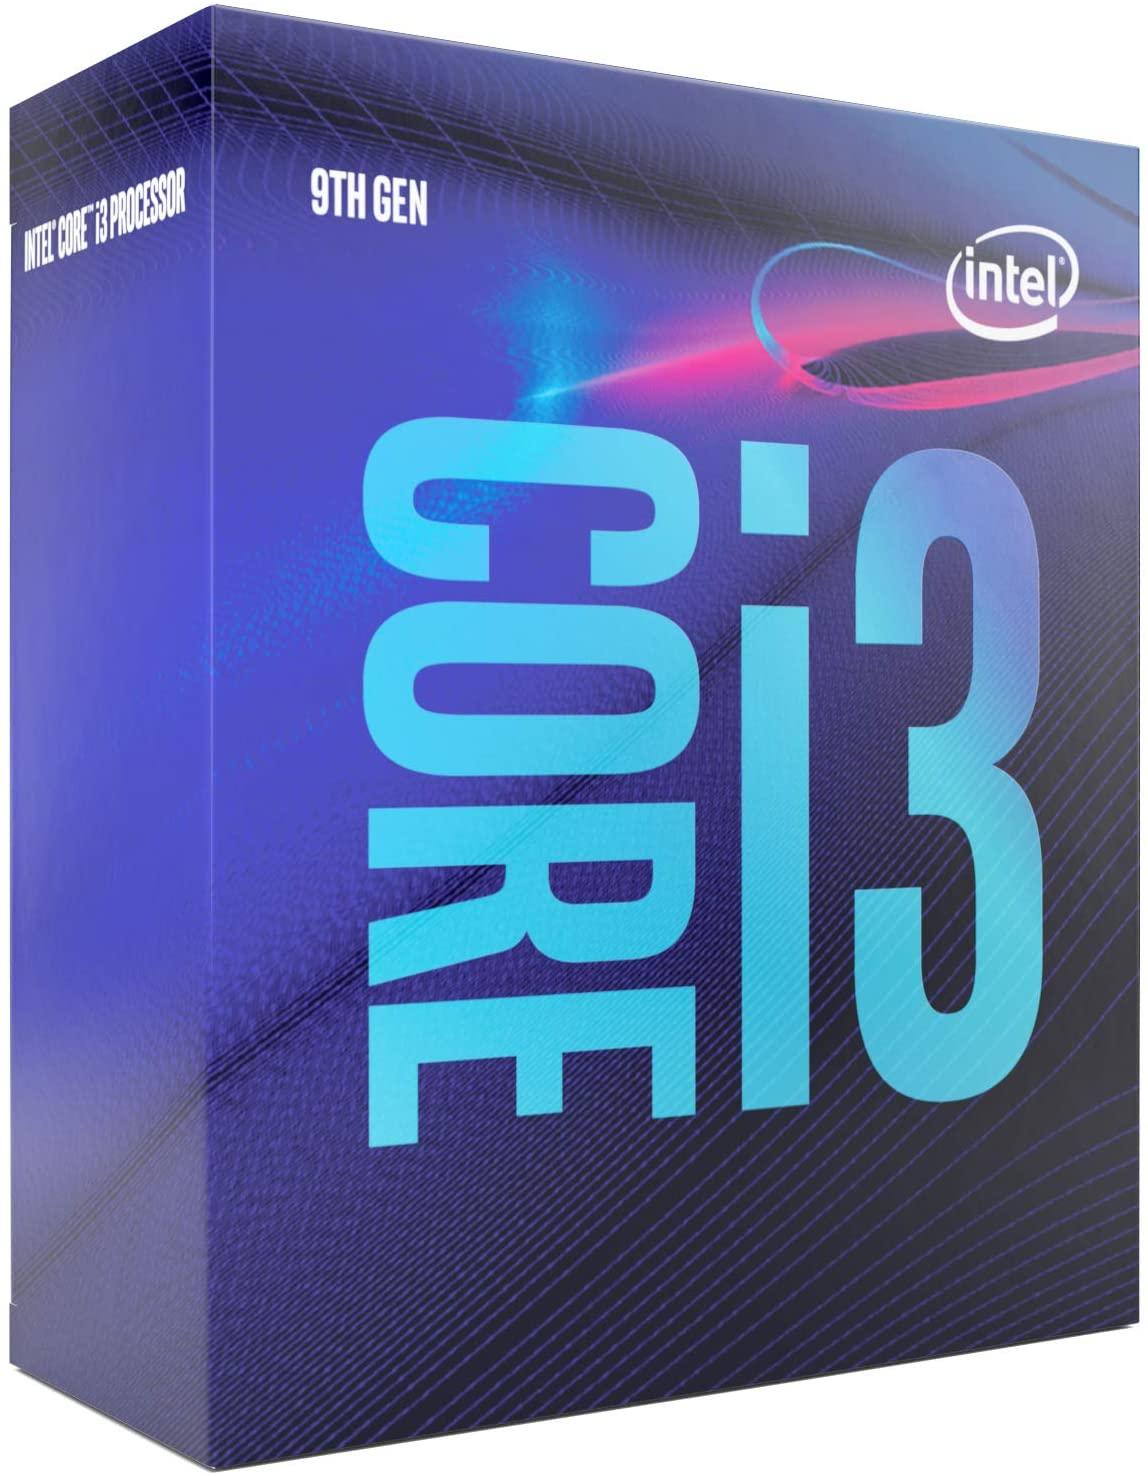 Intel Core CPU i3-9100 Quad-core 3,6-4,2Ghz (9th Gen) @ Amazon.de